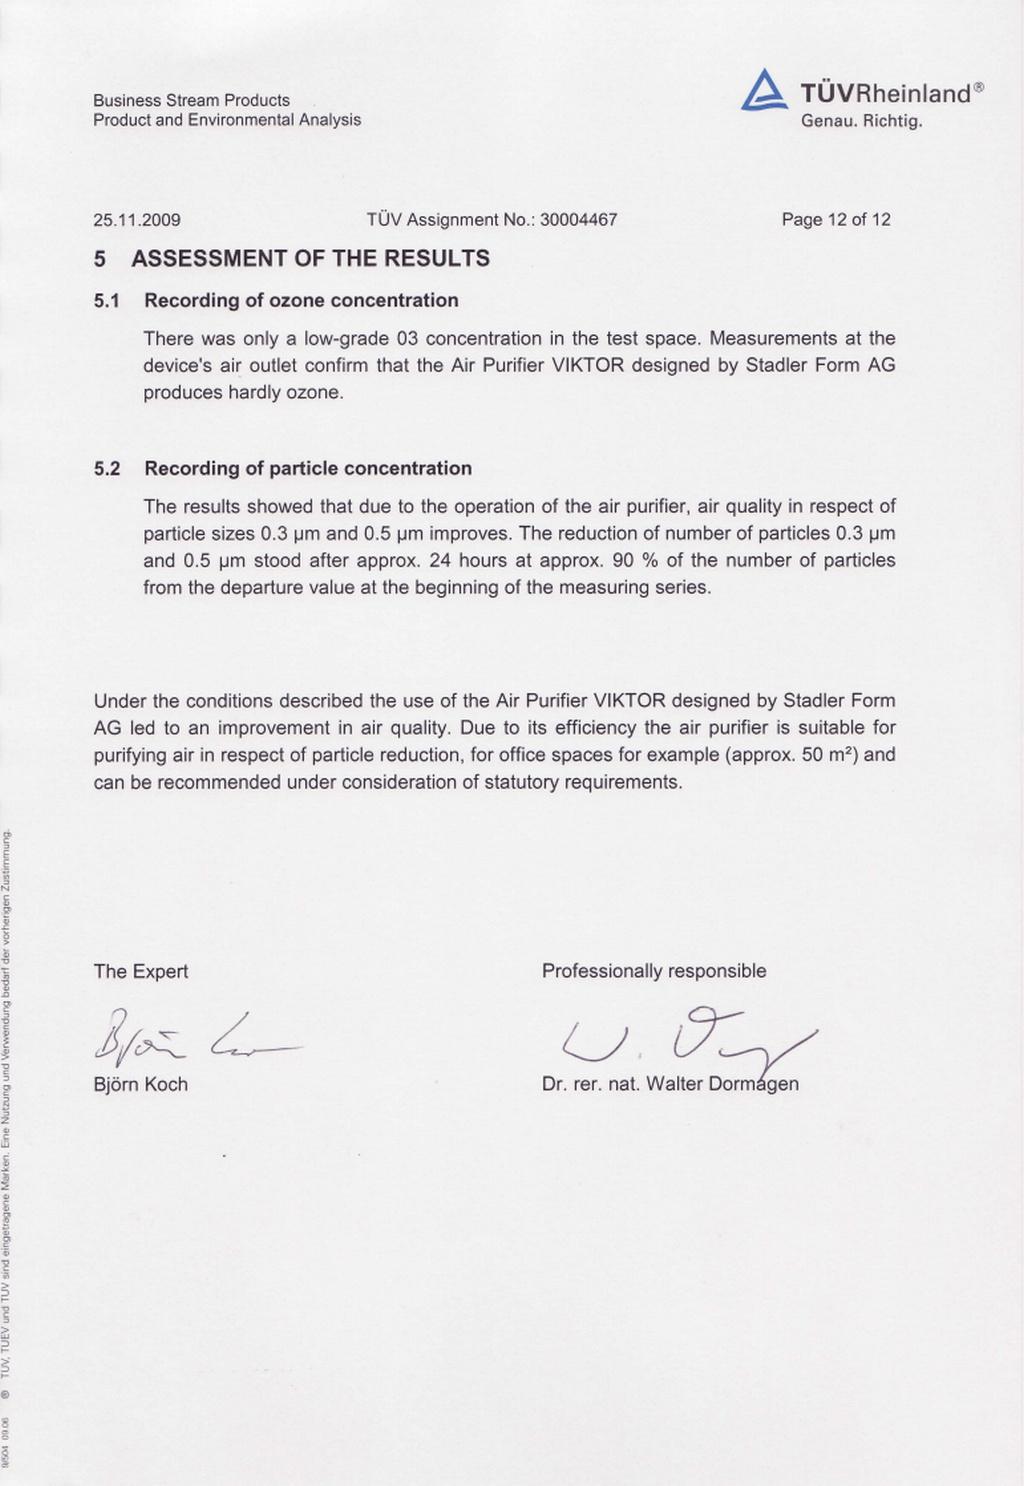 Stadler Form Viktor Feature TÜV Rheinland Assessment Verification